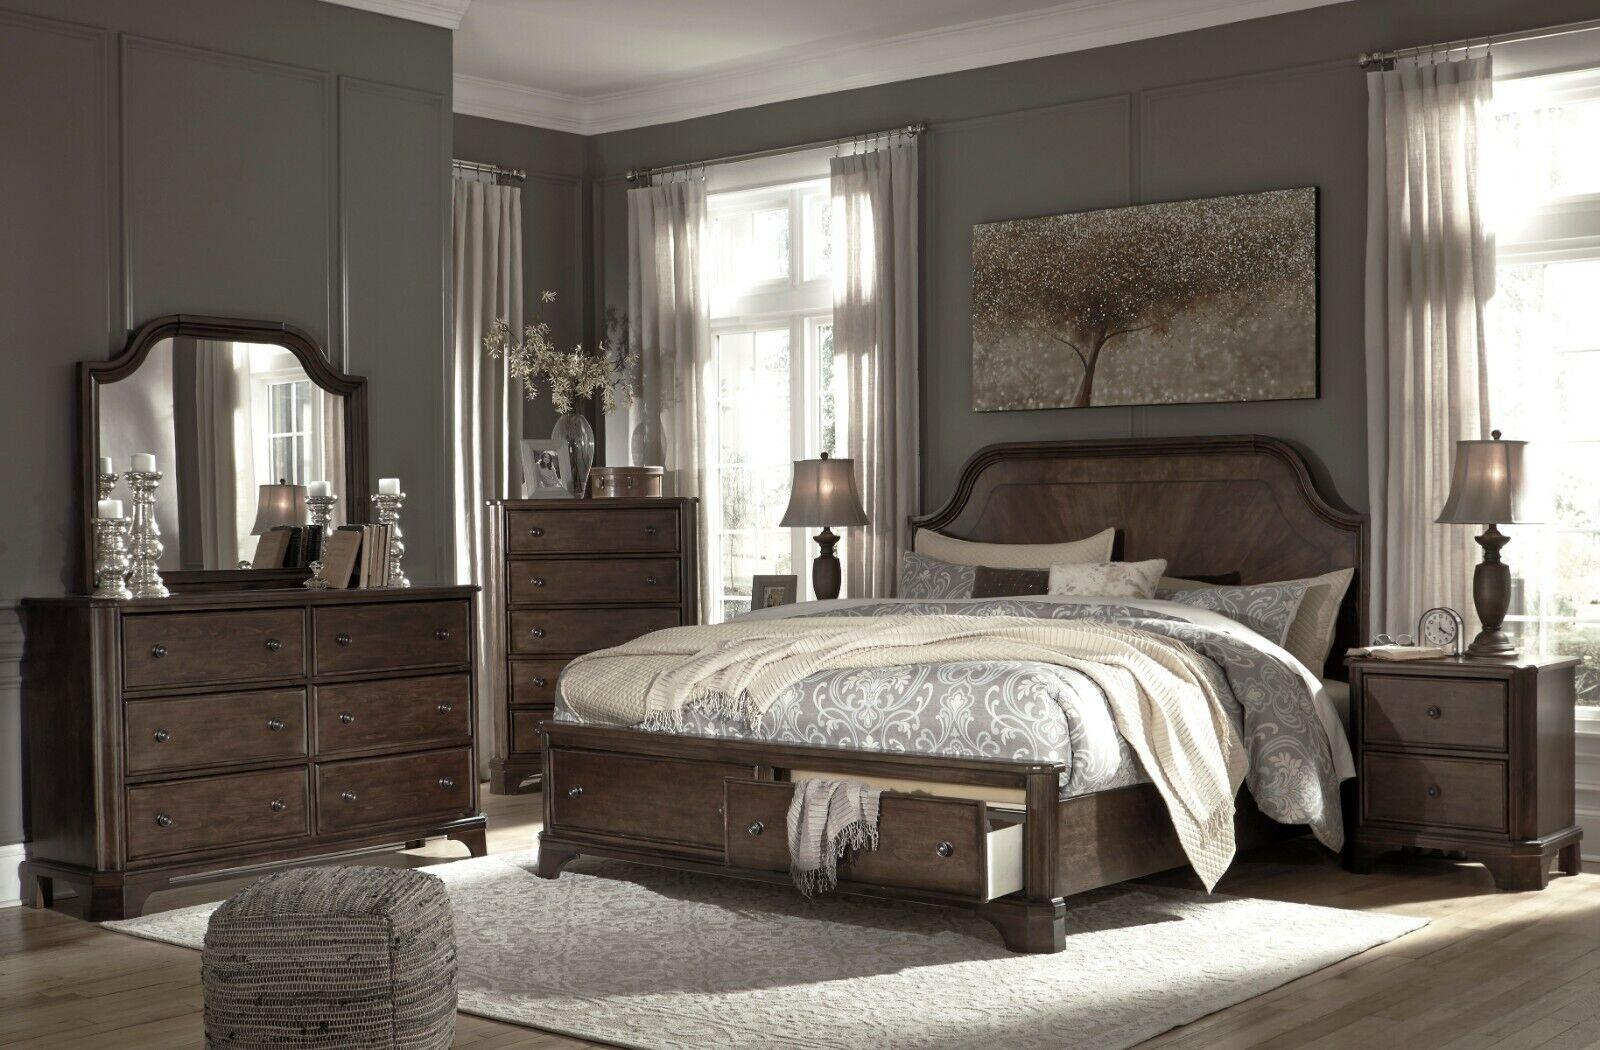 Ashley Furniture Adinton Queen Panel 6 Piece Storage Bedroom Set For Sale Online